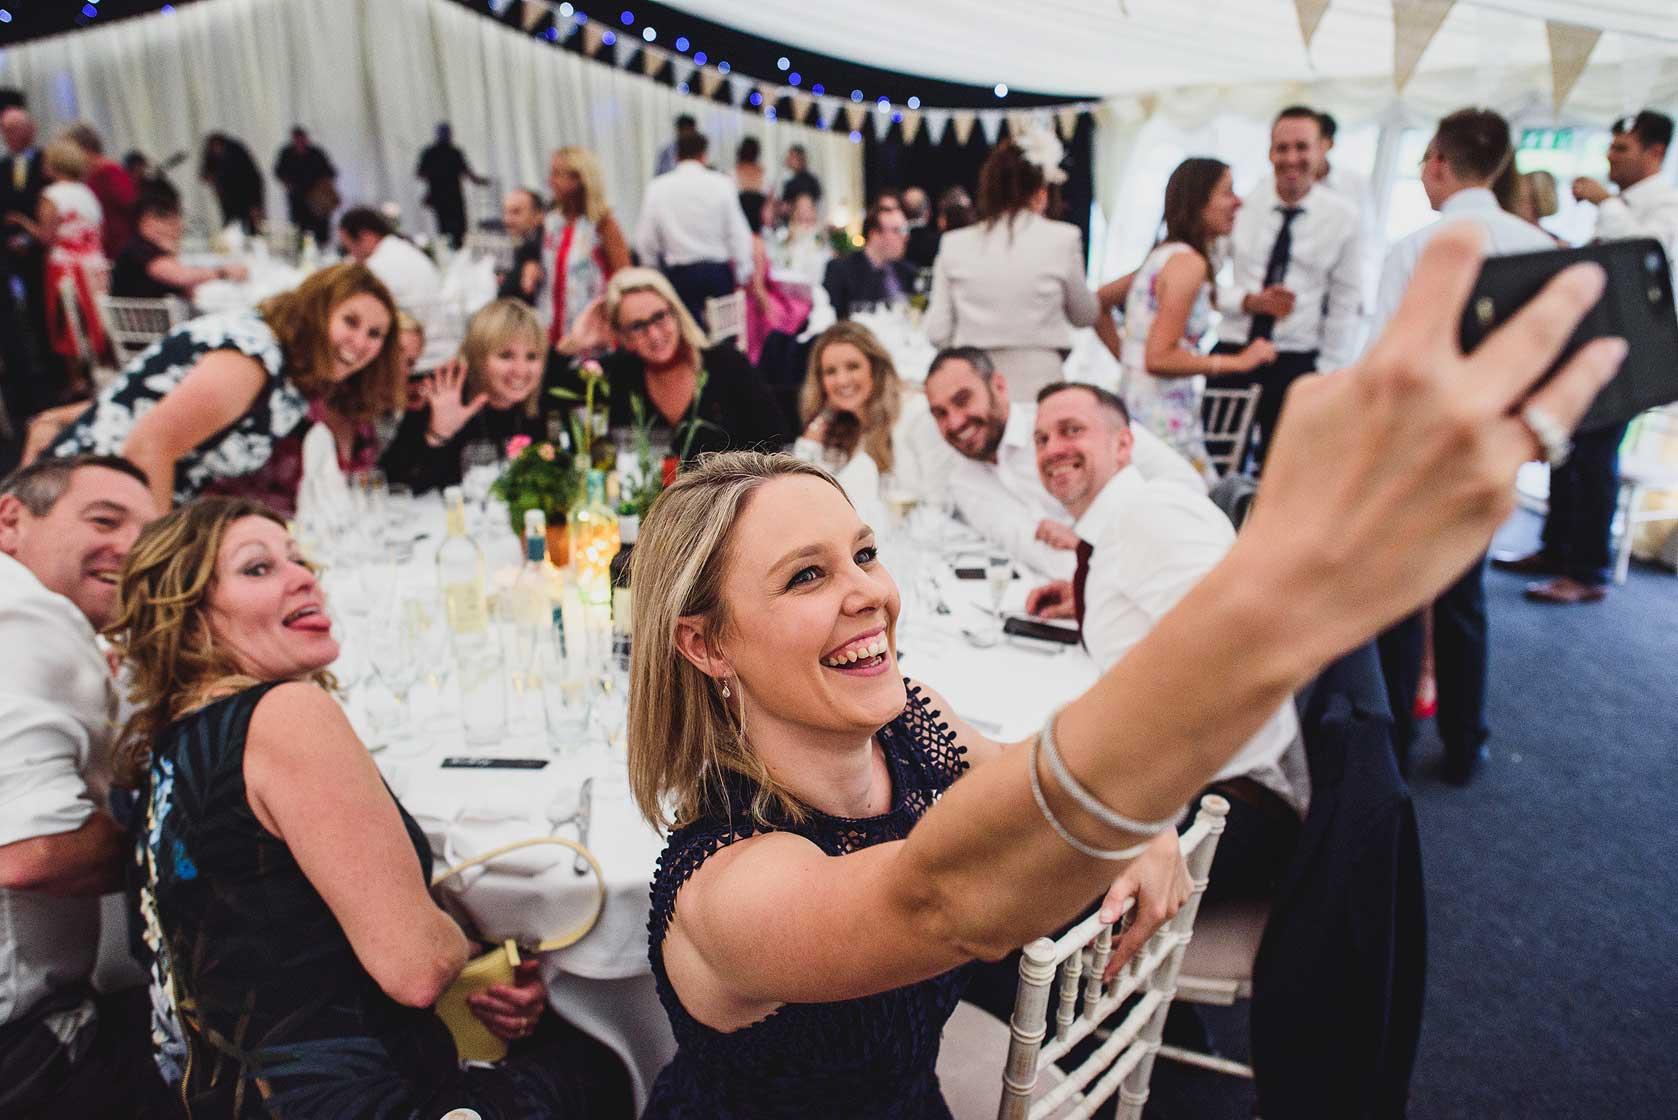 Reportage Wedding Photography at Belvoir Castle